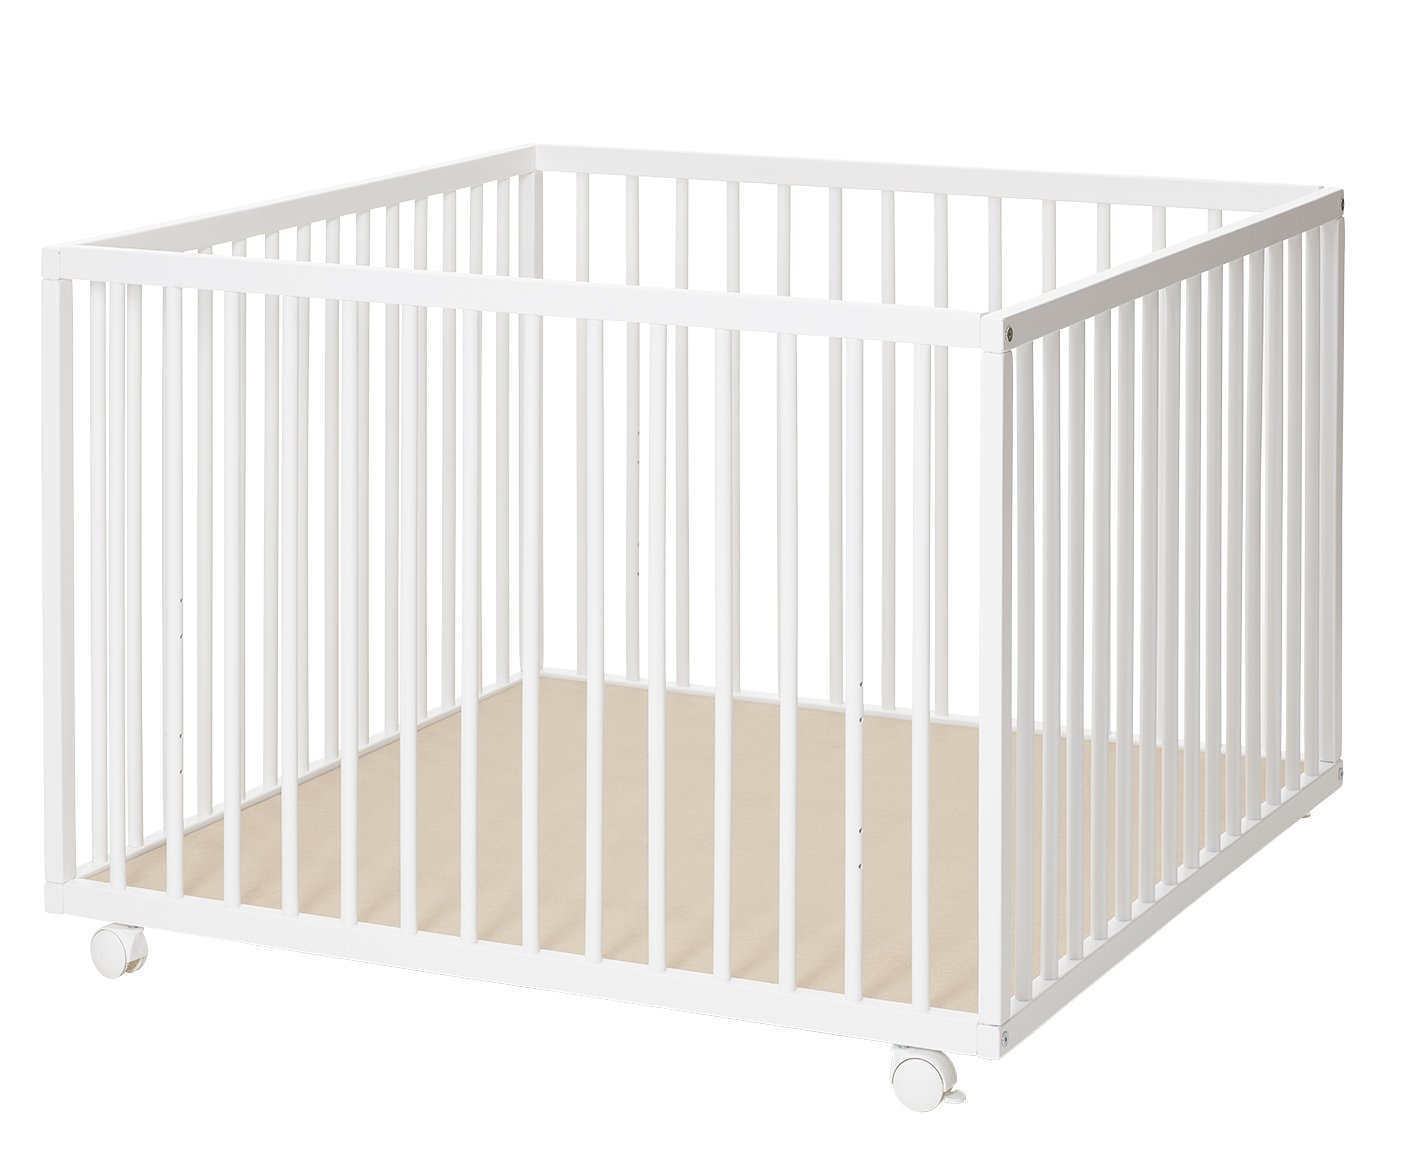 BabyDan Large Wooden Playpen, White, 1 m x 1 m BabyDan A/S 6267-01-75